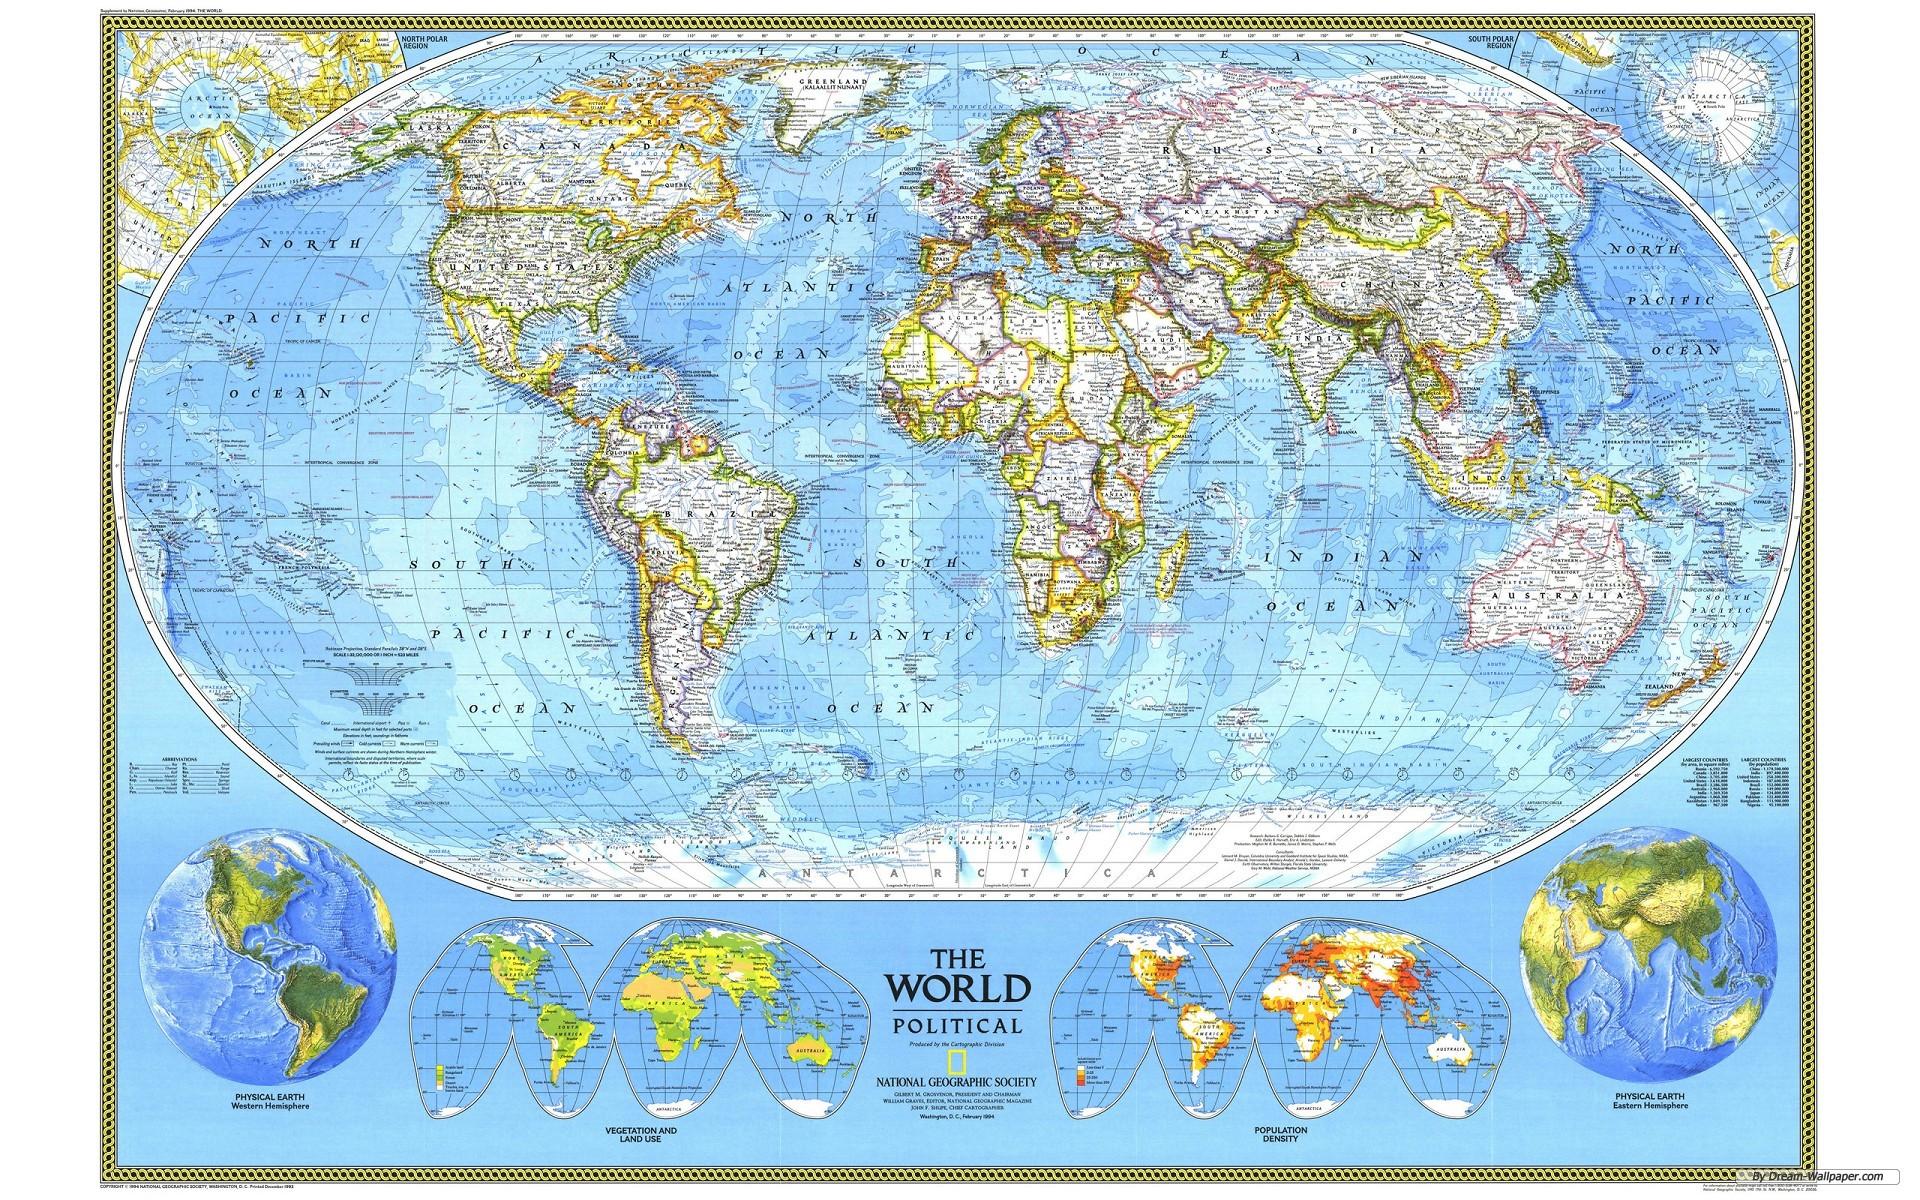 Map wallpaper wallpapersafari world map wallpaper 469871 1920x1200 gumiabroncs Images